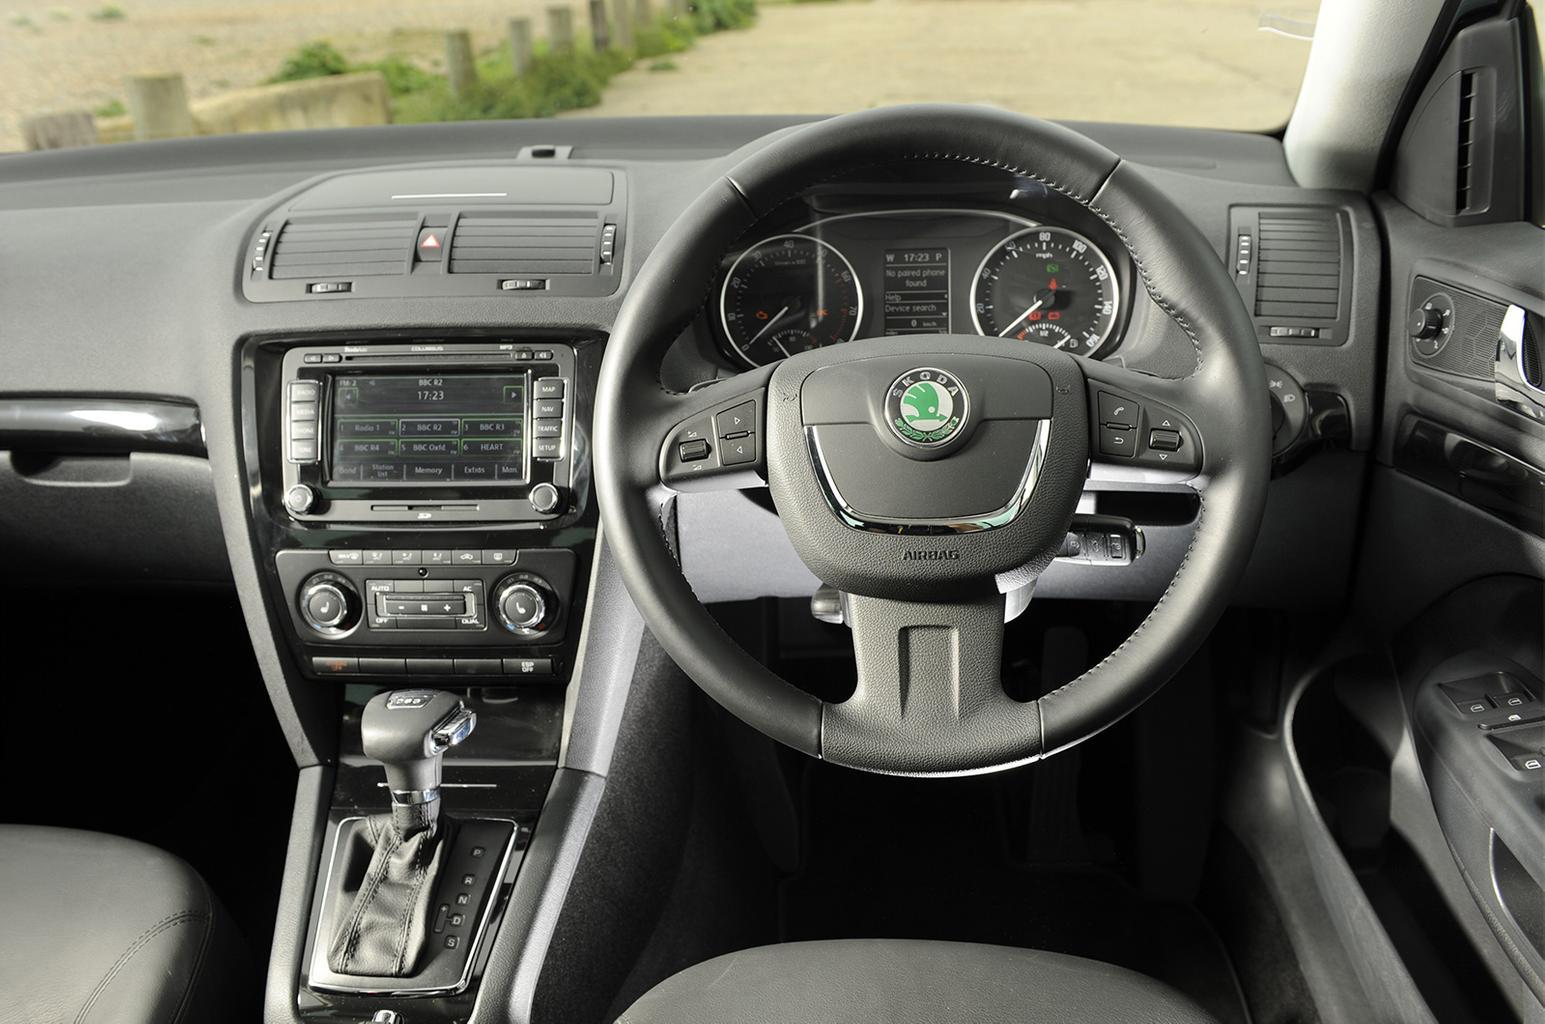 Used car of the week: Skoda Octavia